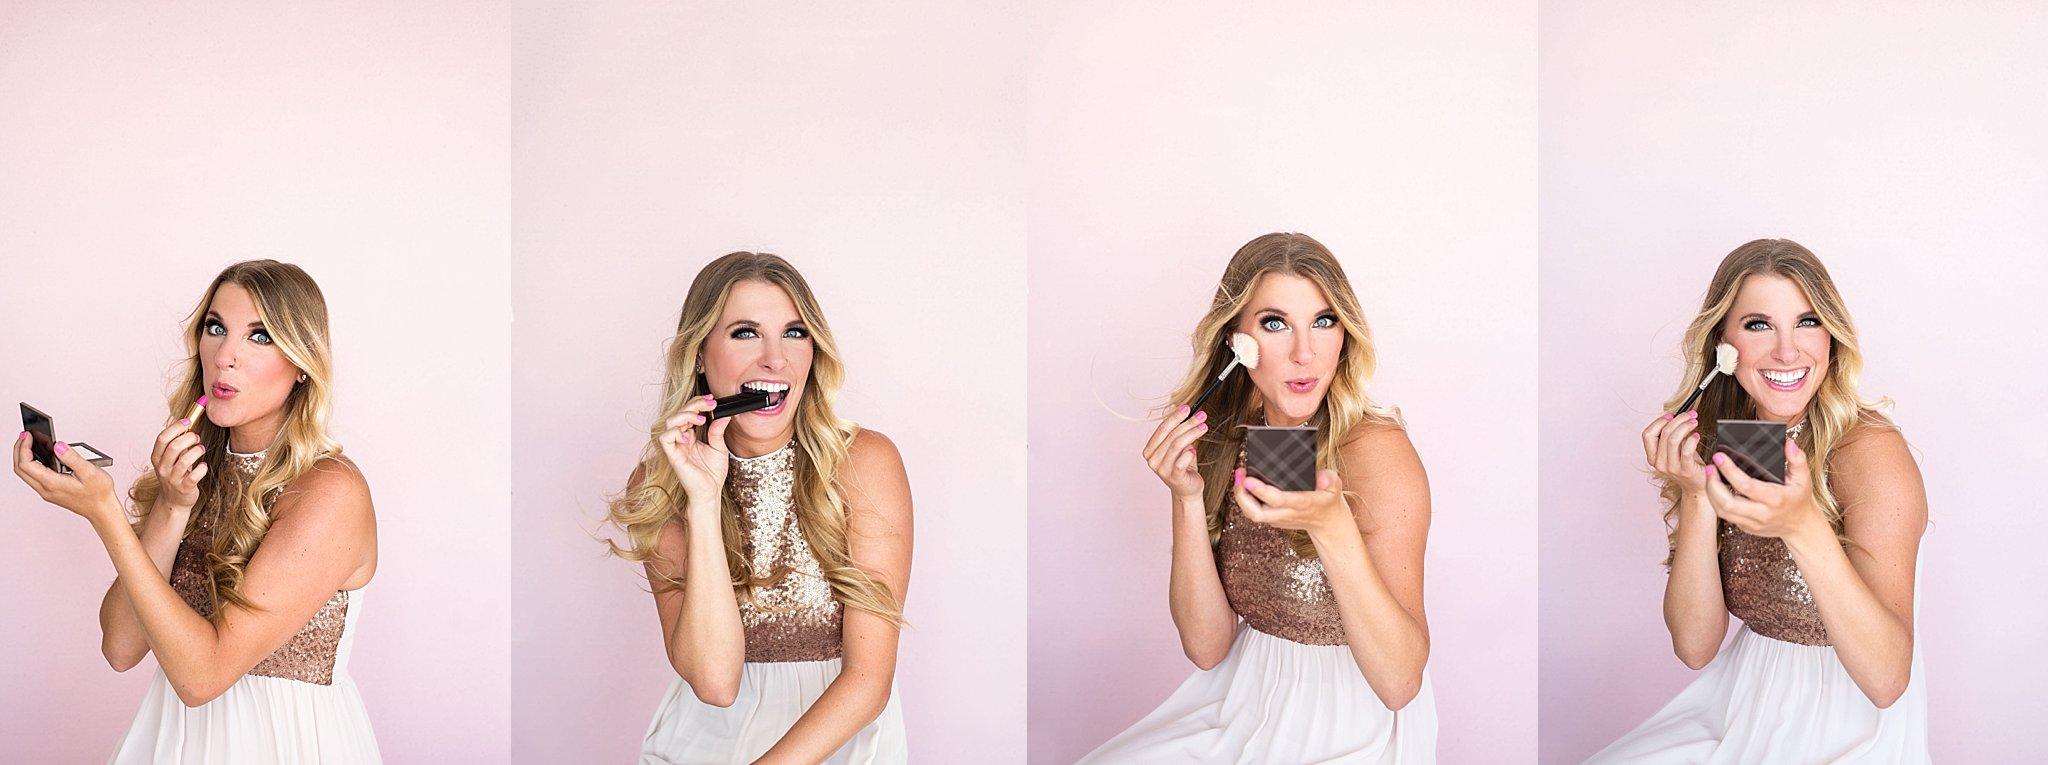 creative-headshots-pink-background-blonde-hair-style-makeup-artist.jpg